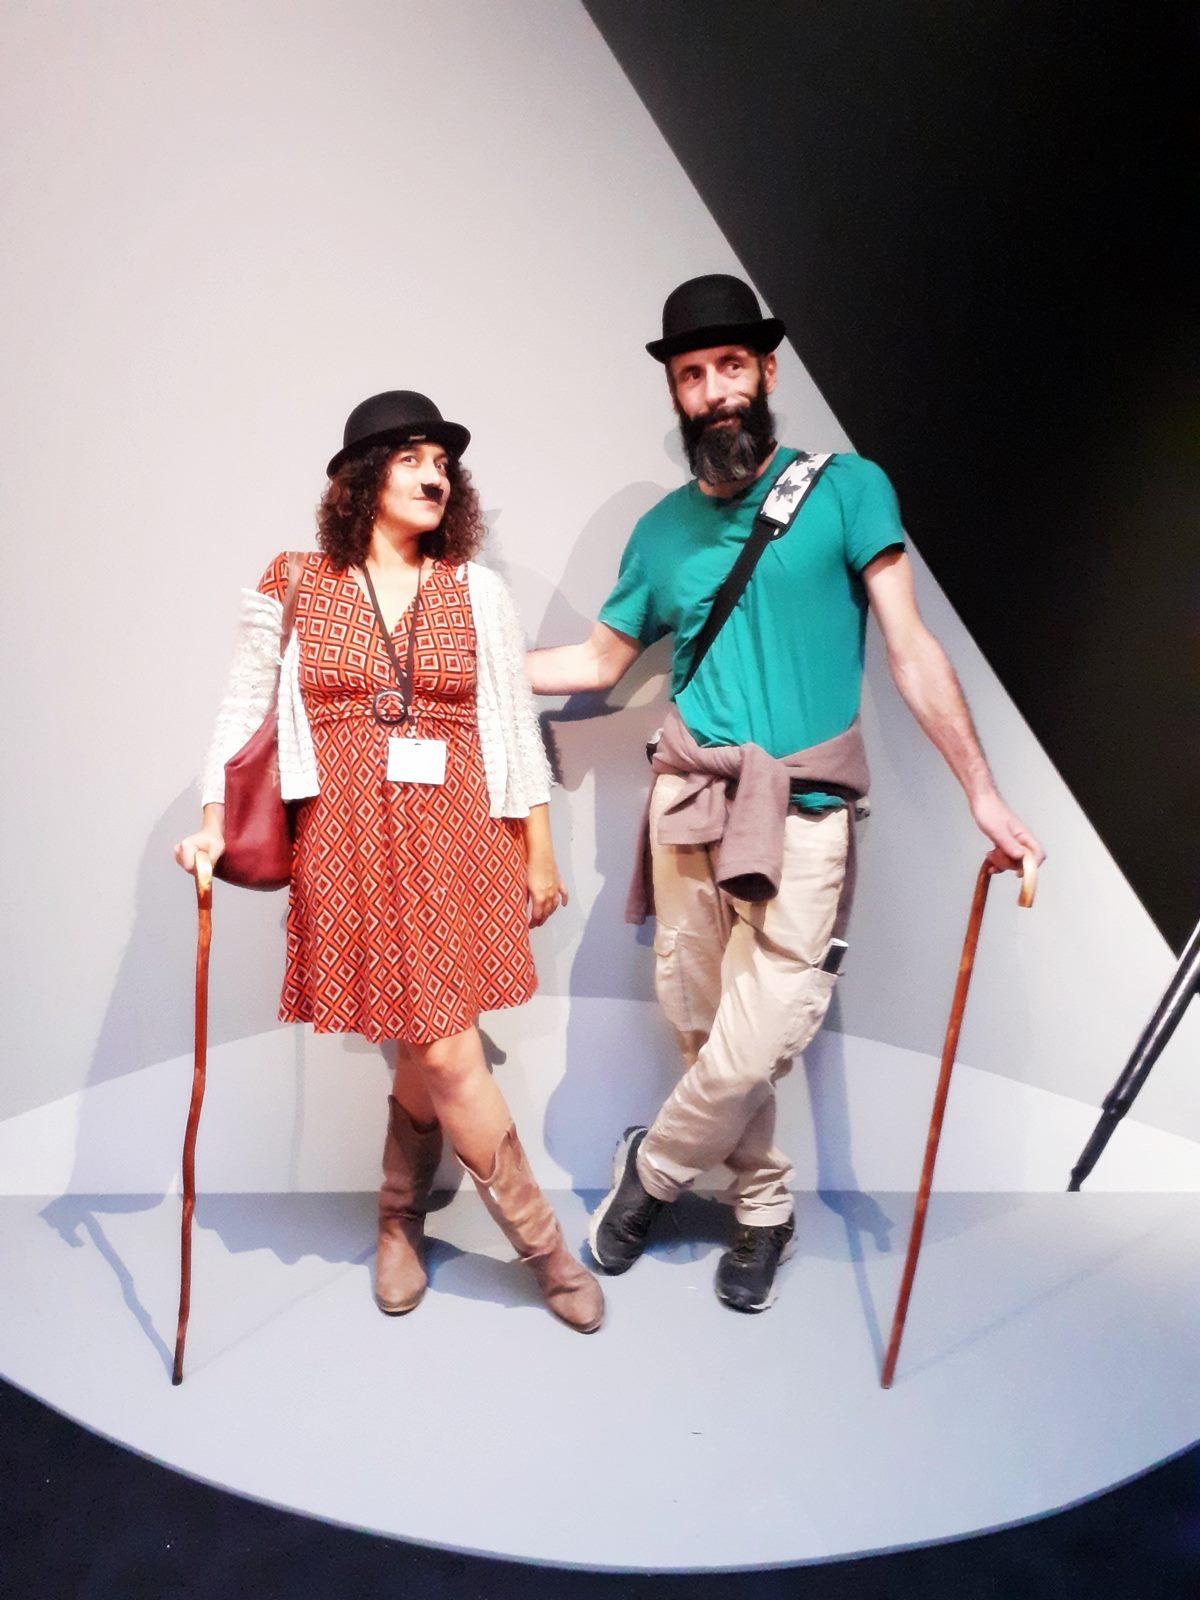 Exposition charlie chaplin nantes musee20191021 165302